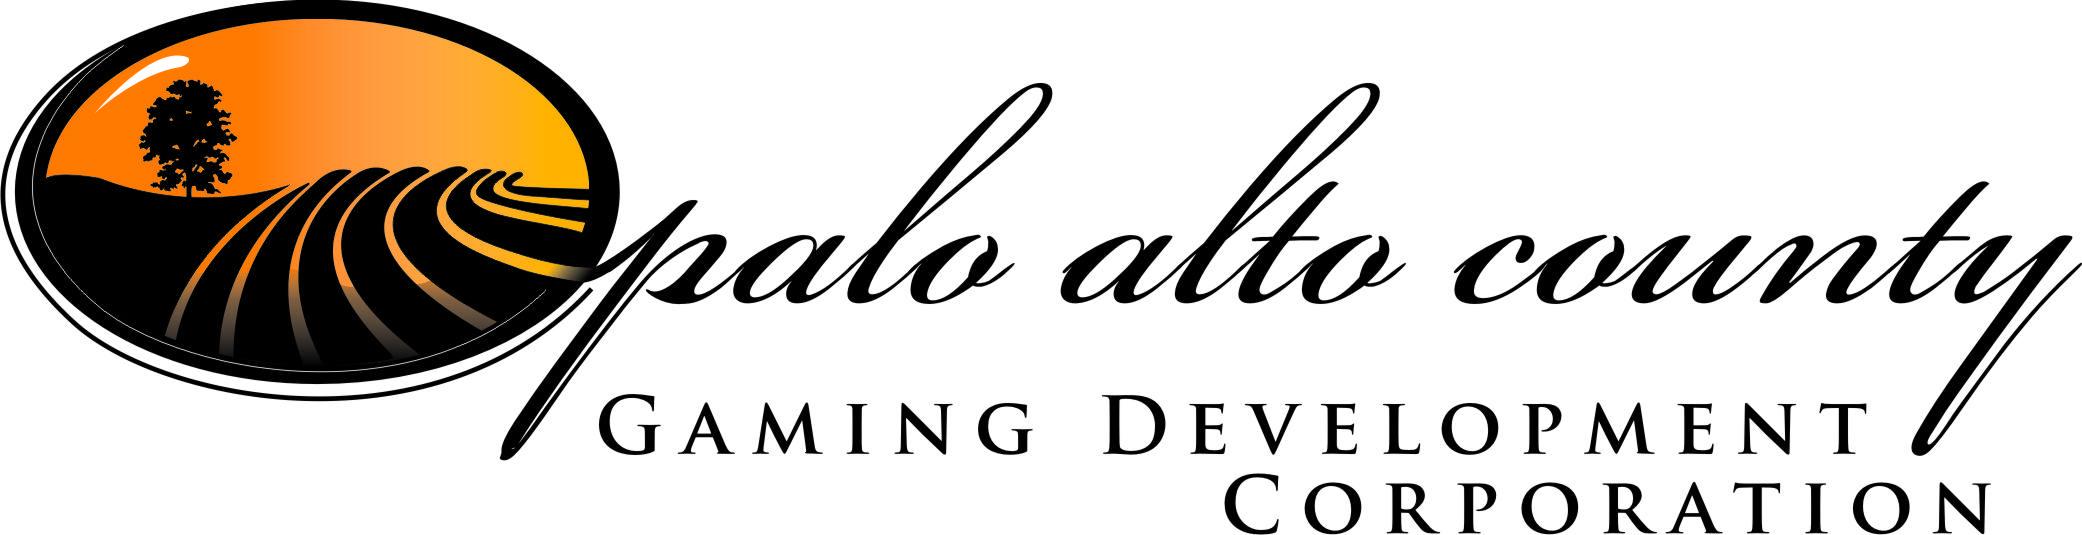 pacgaming logo.